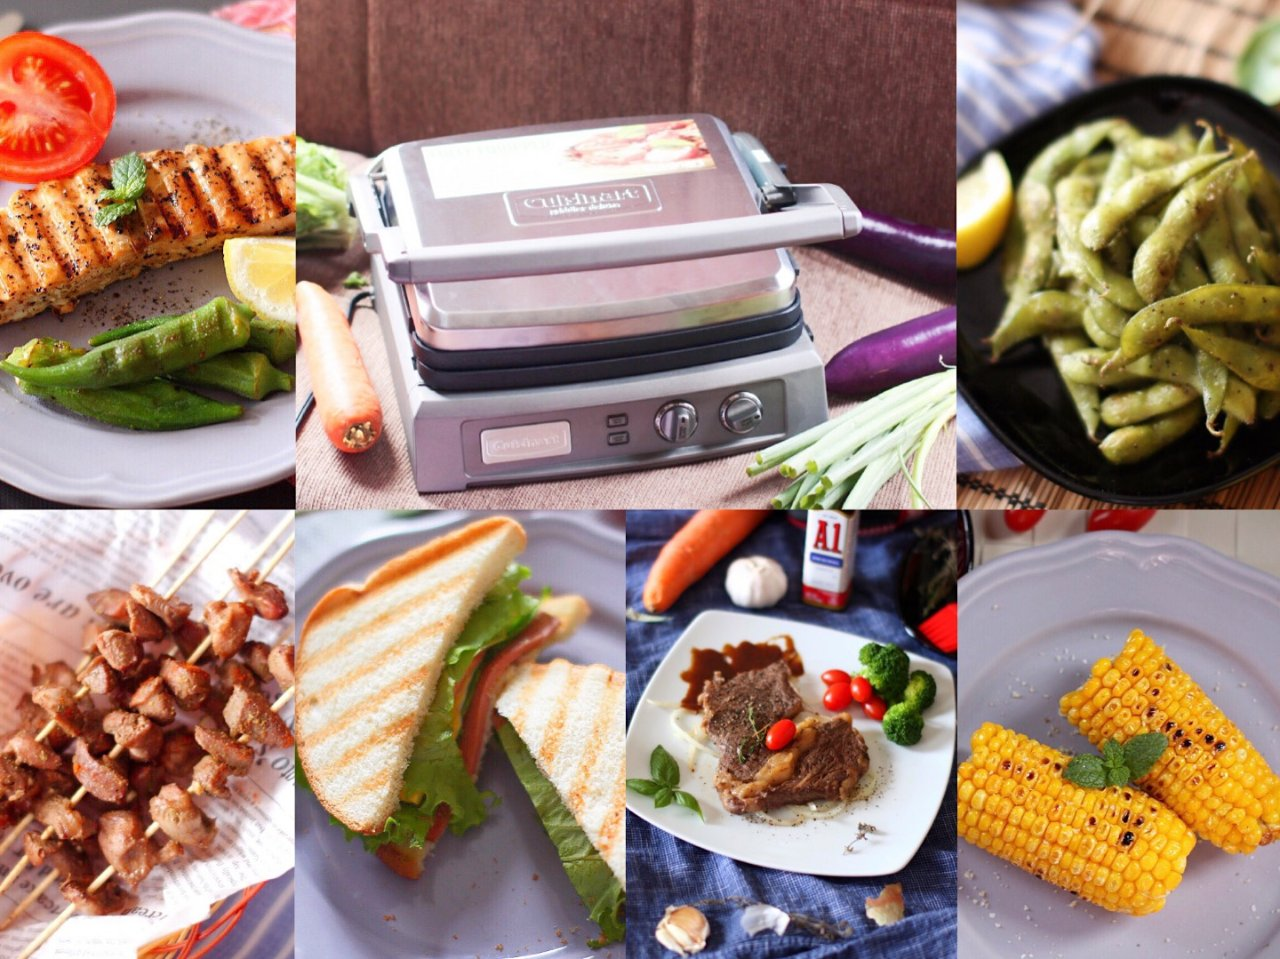 Cuisinart多功能煎烤机   一秒让你摇身变大厨